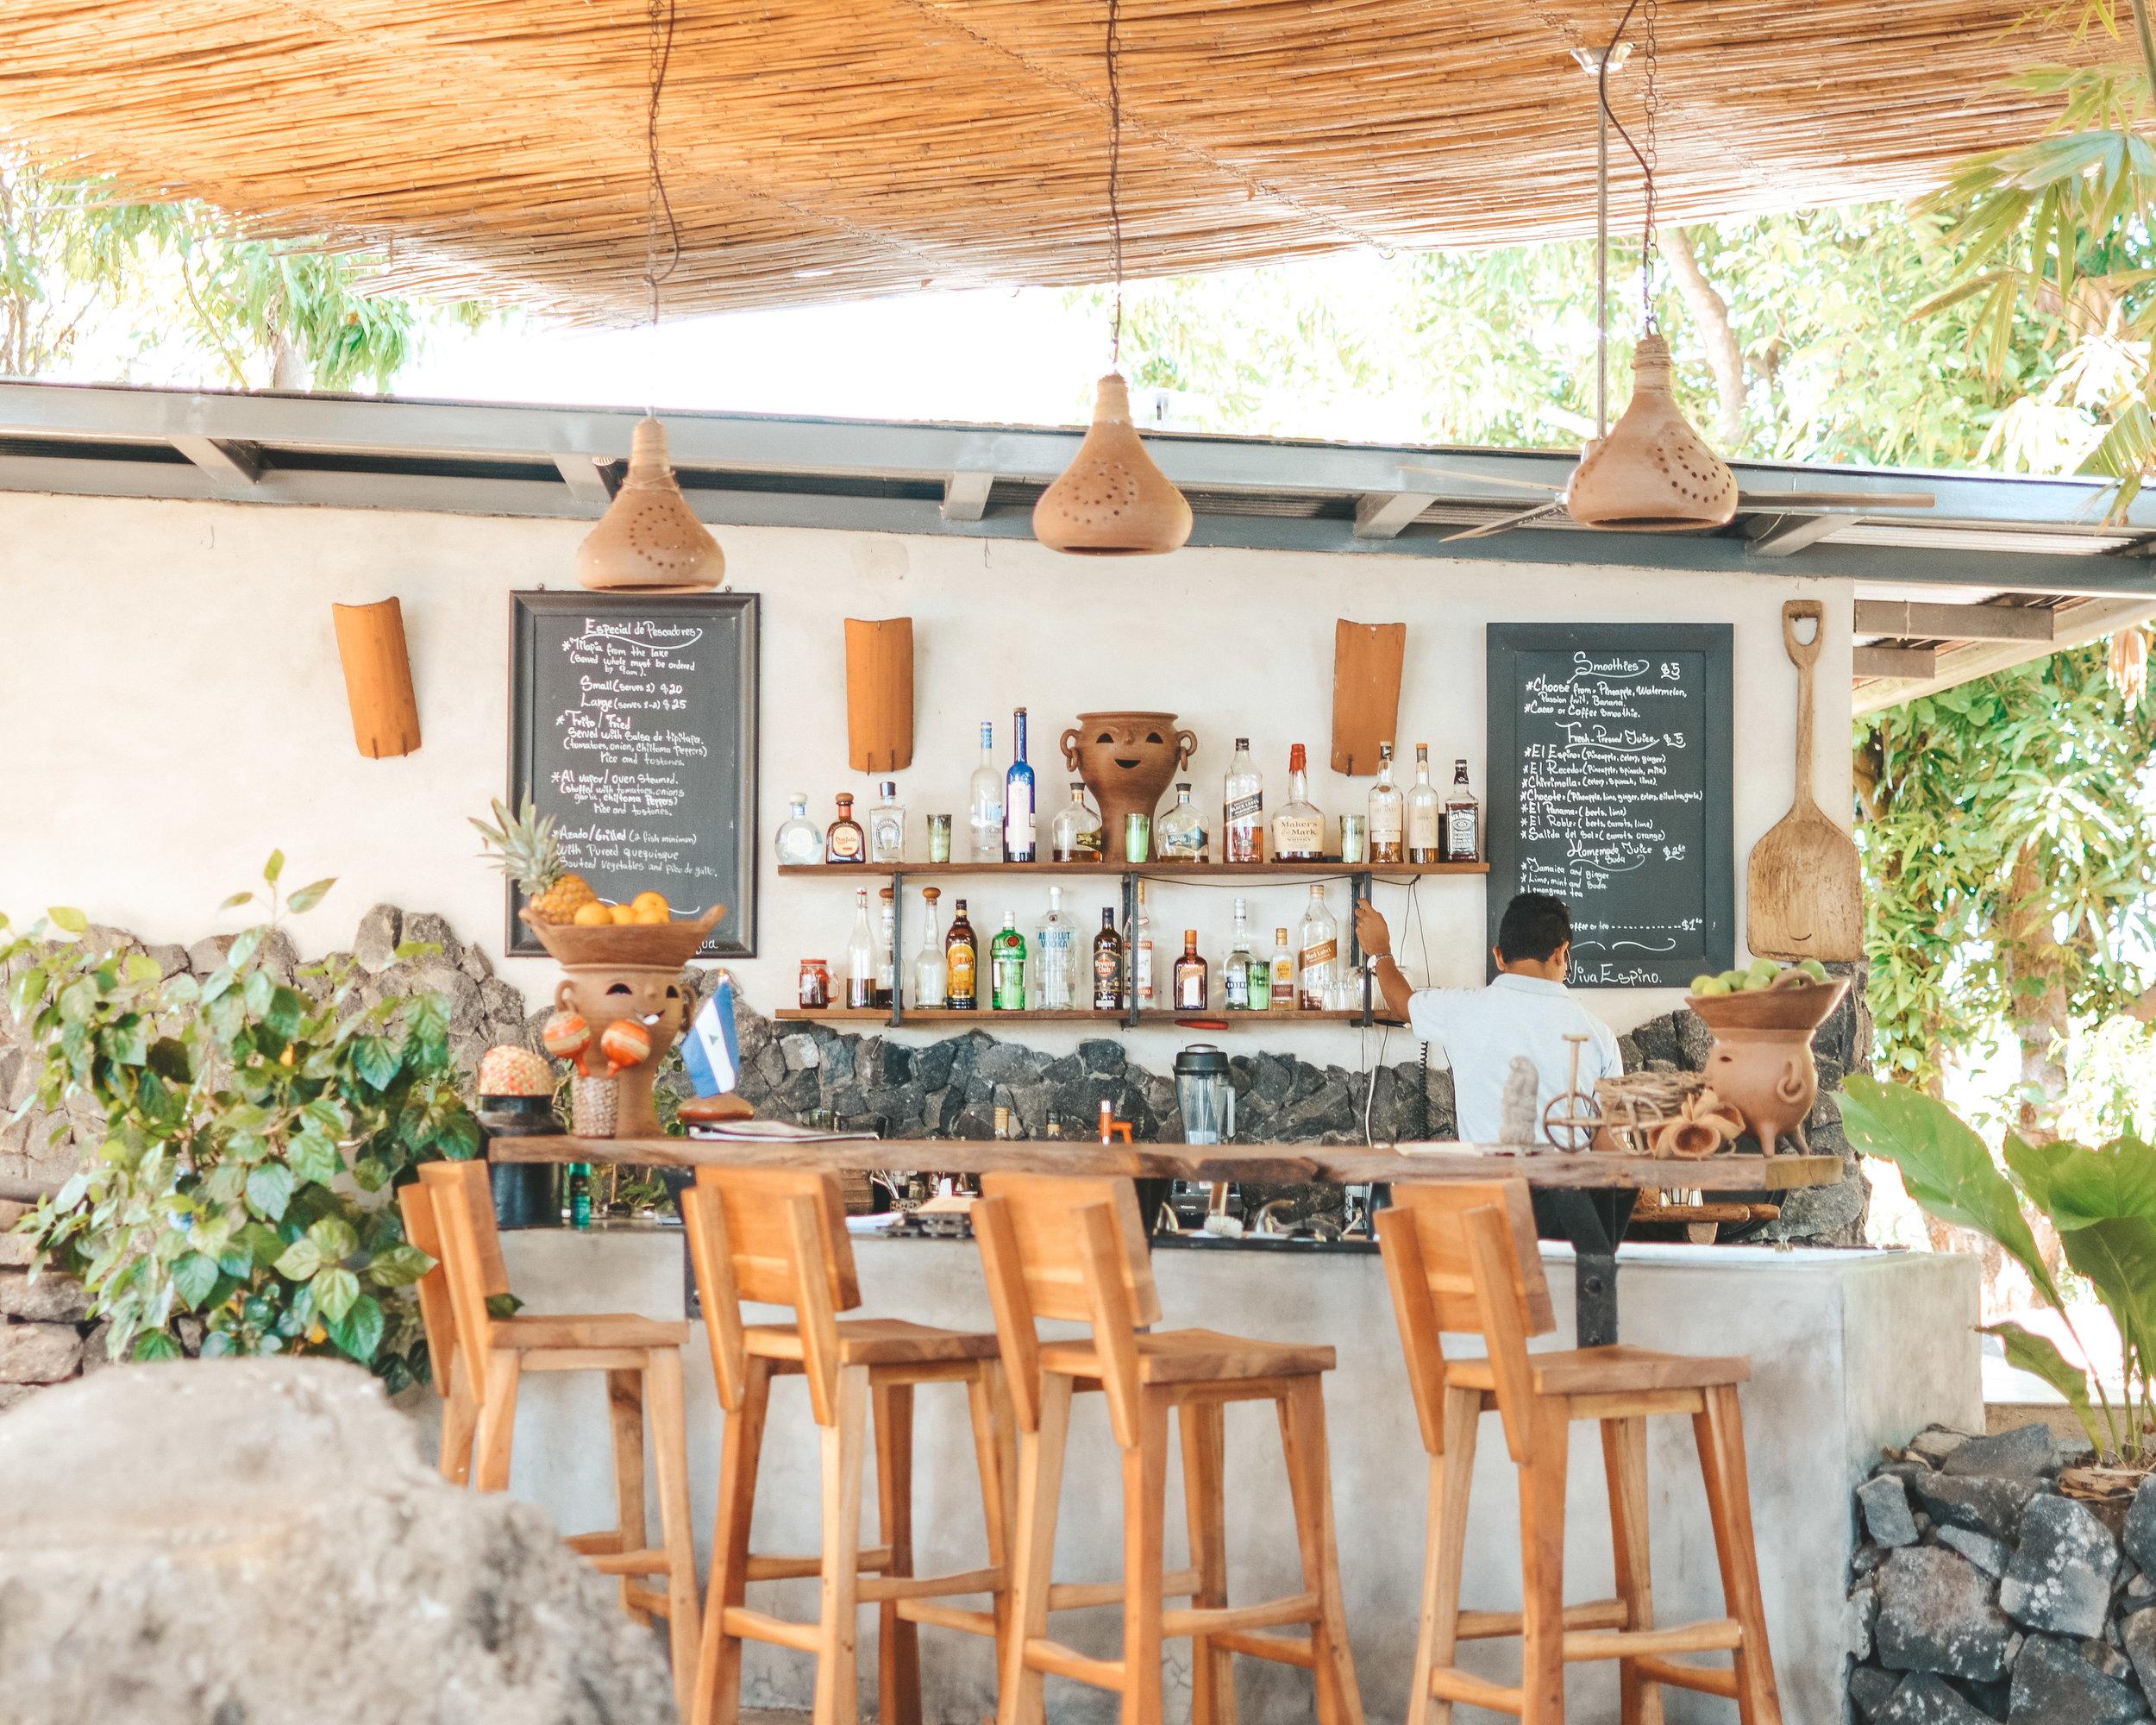 The bar at Isleta el Espino